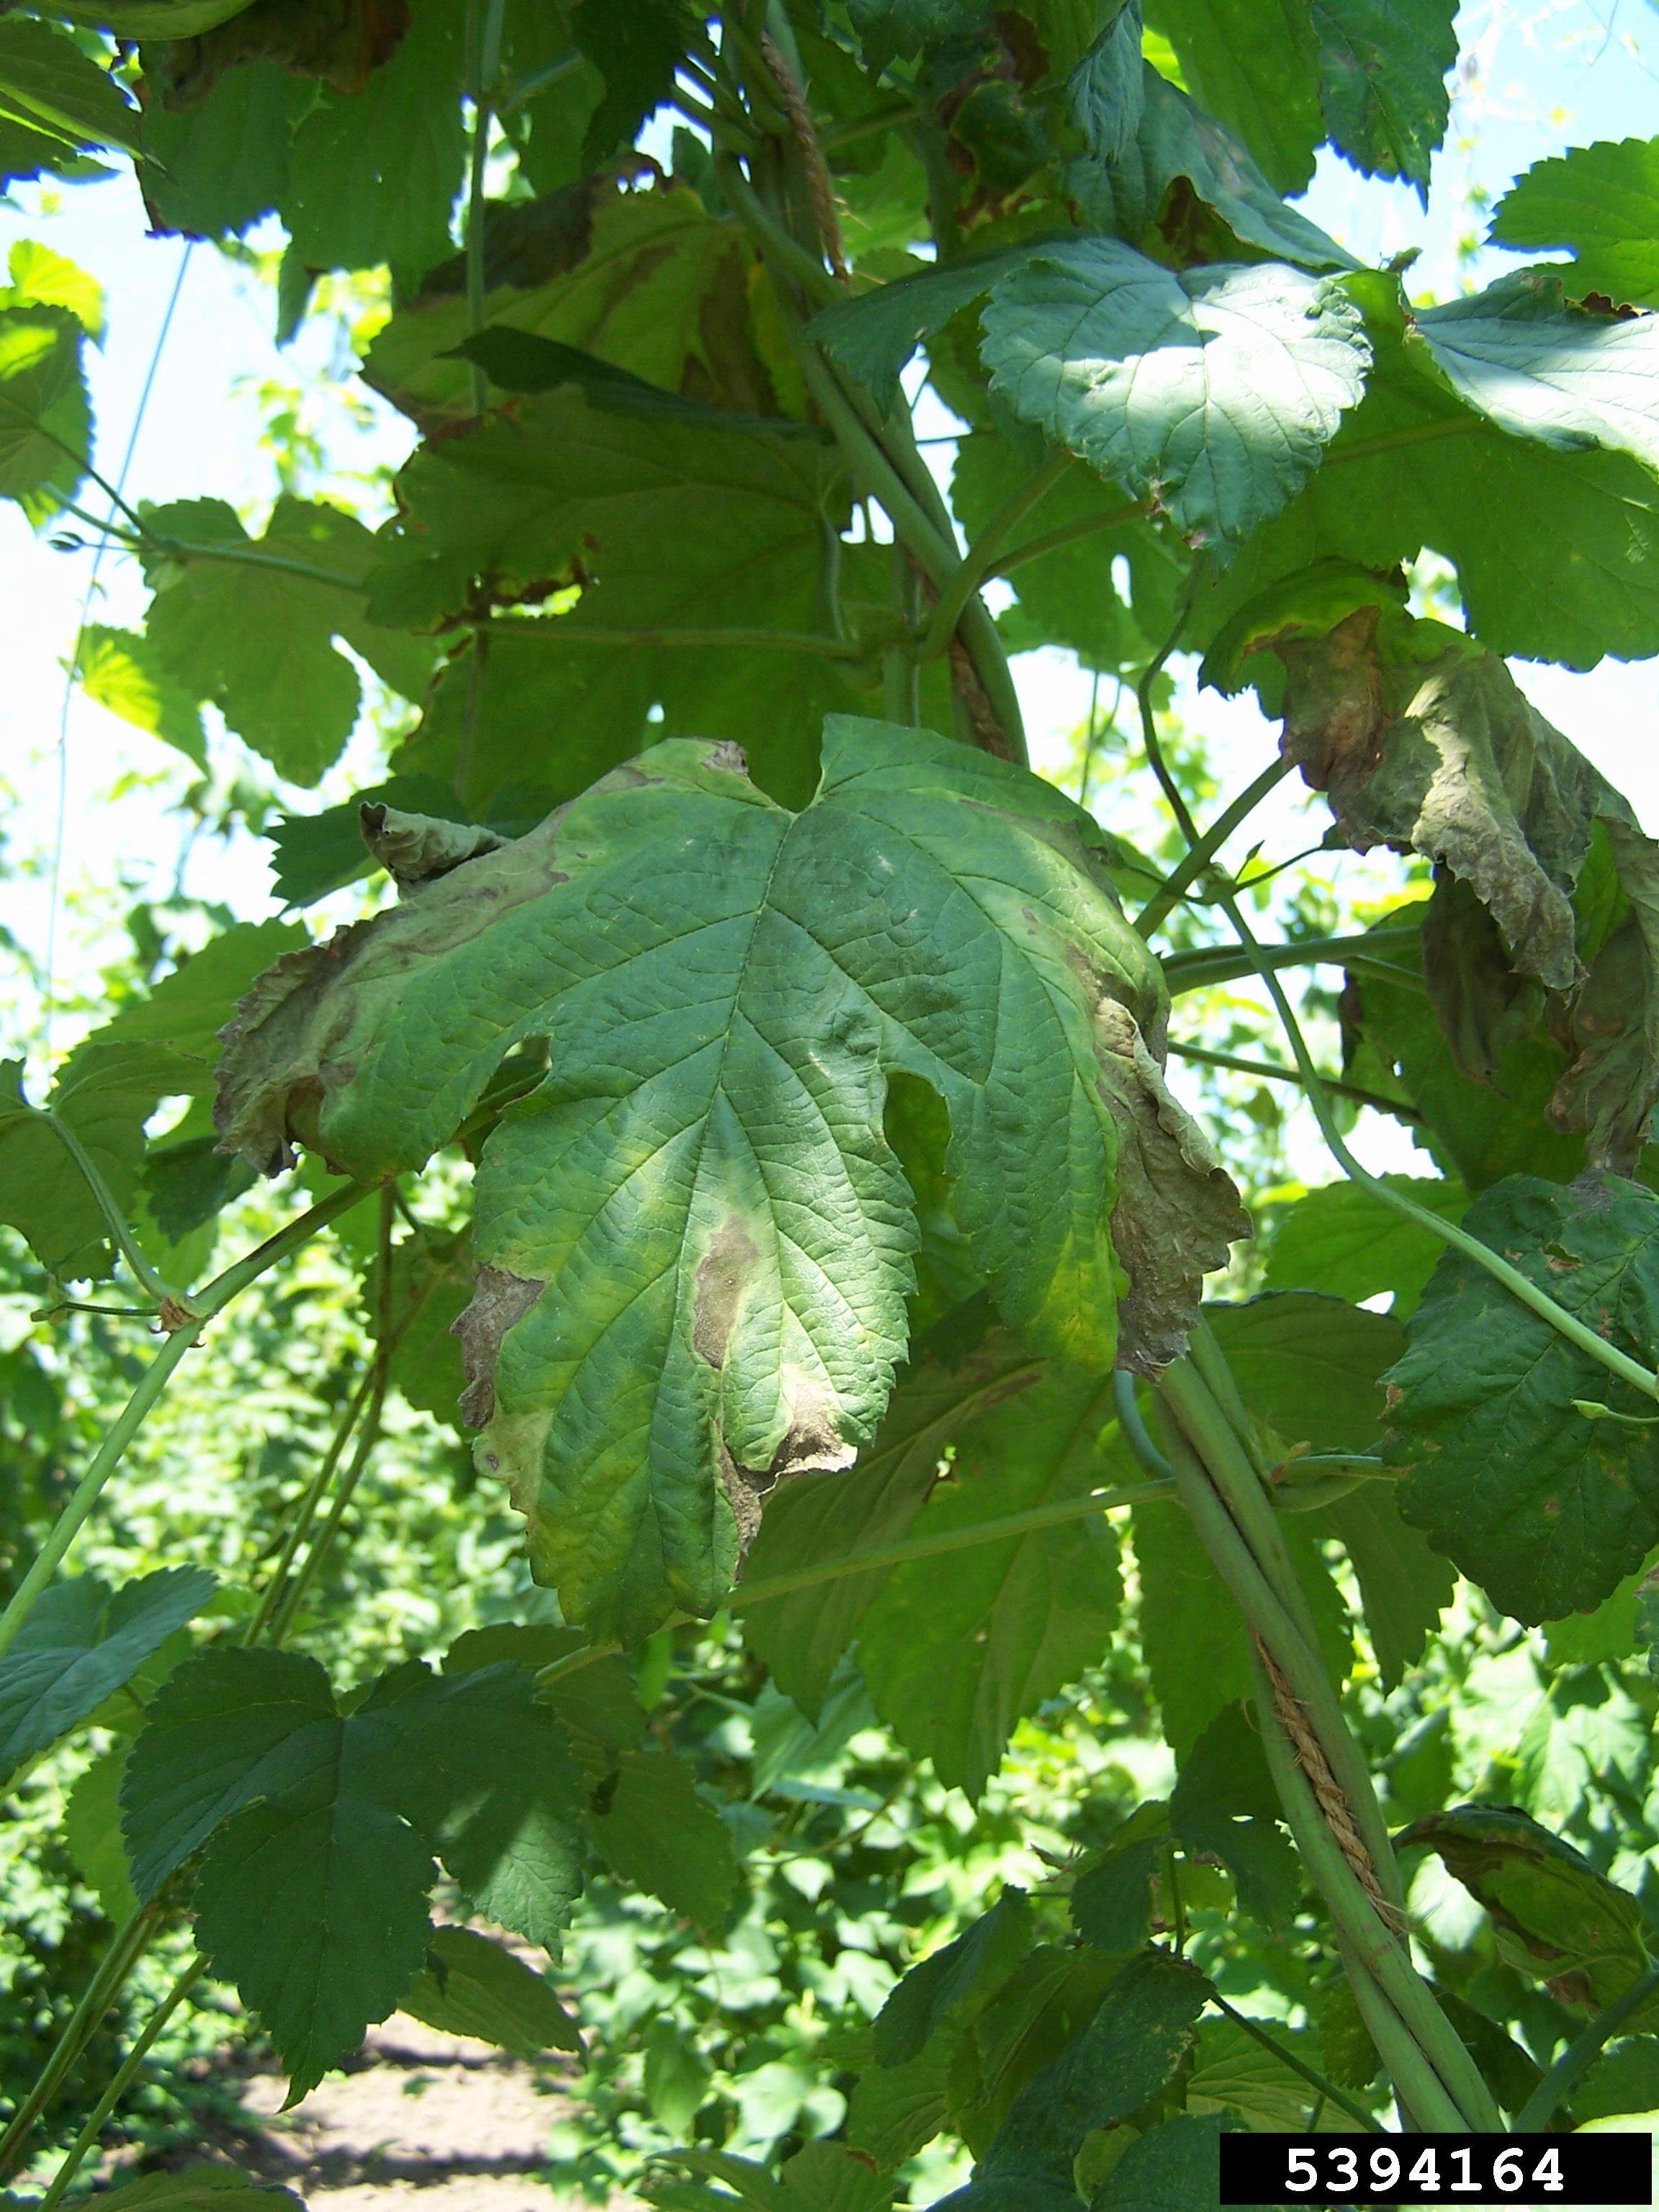 File:Verticillium wilt on hops.jpg